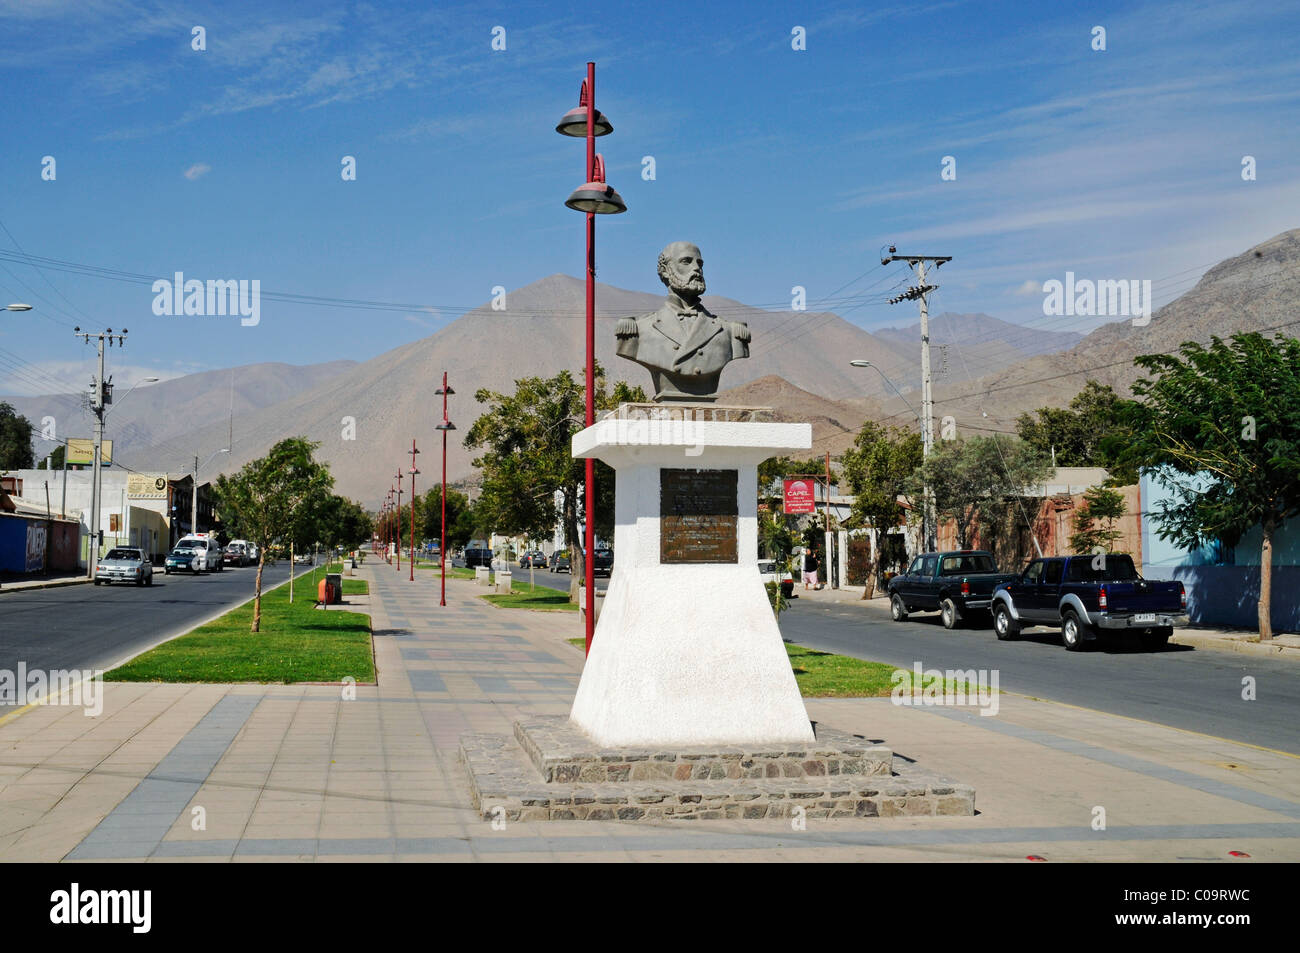 Streets, monument, Arturo Prat Chacon, war hero, captain, Vicuna, Valle d'Elqui, Elqui Valley, La Serena, Norte - Stock Image